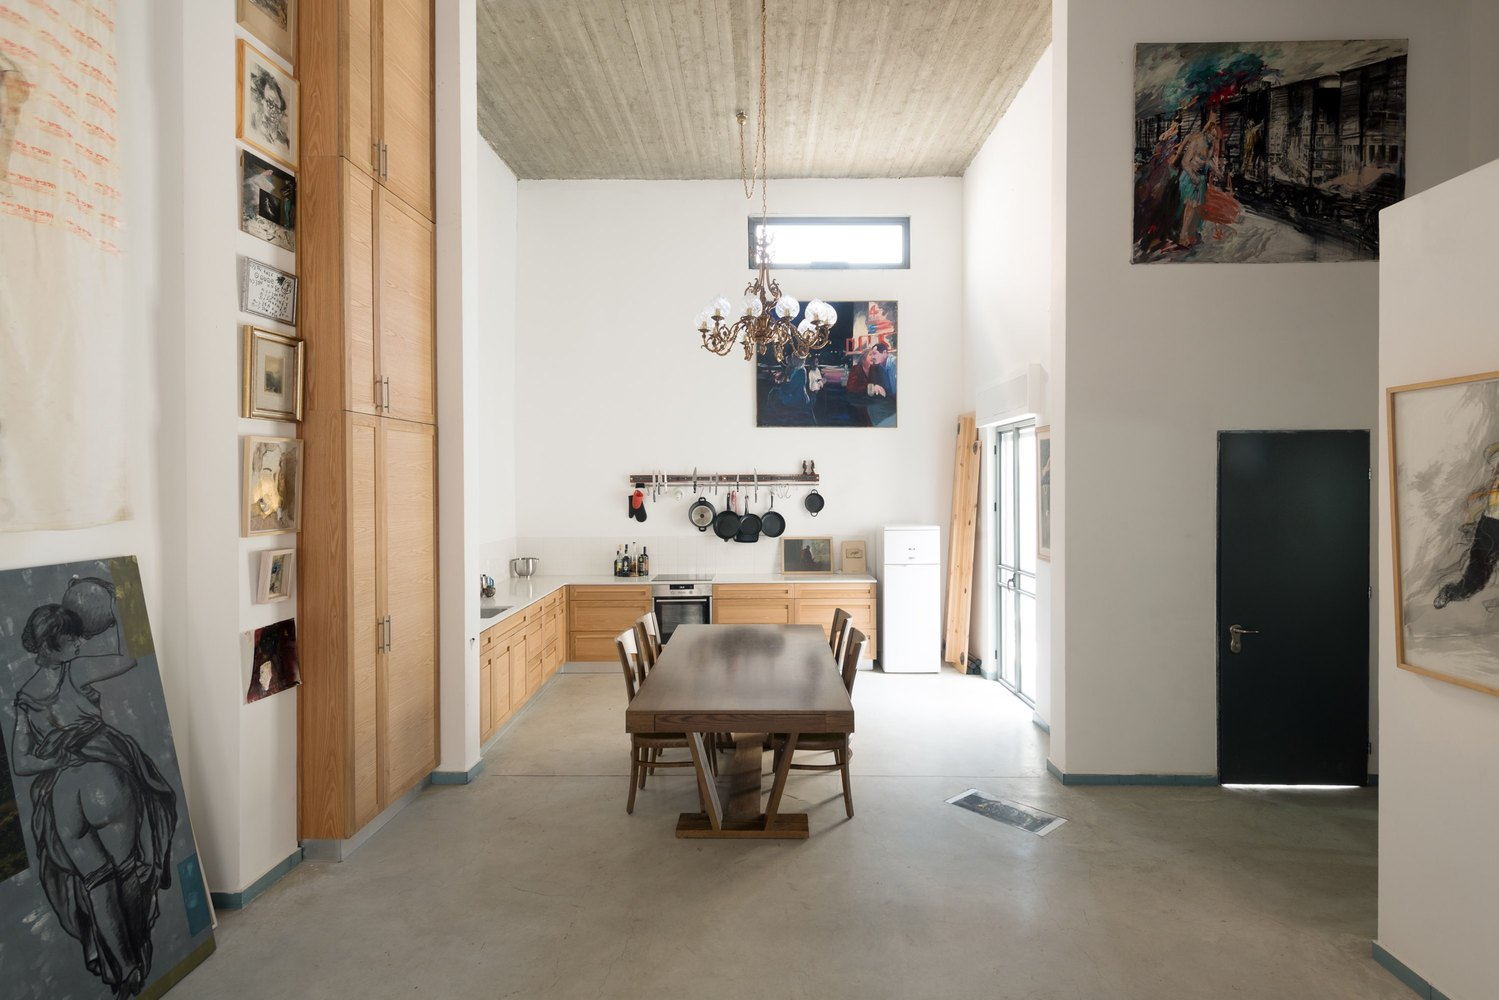 Gallery of Jaffa Art Apartment Building / Pertzov Architecture - 5